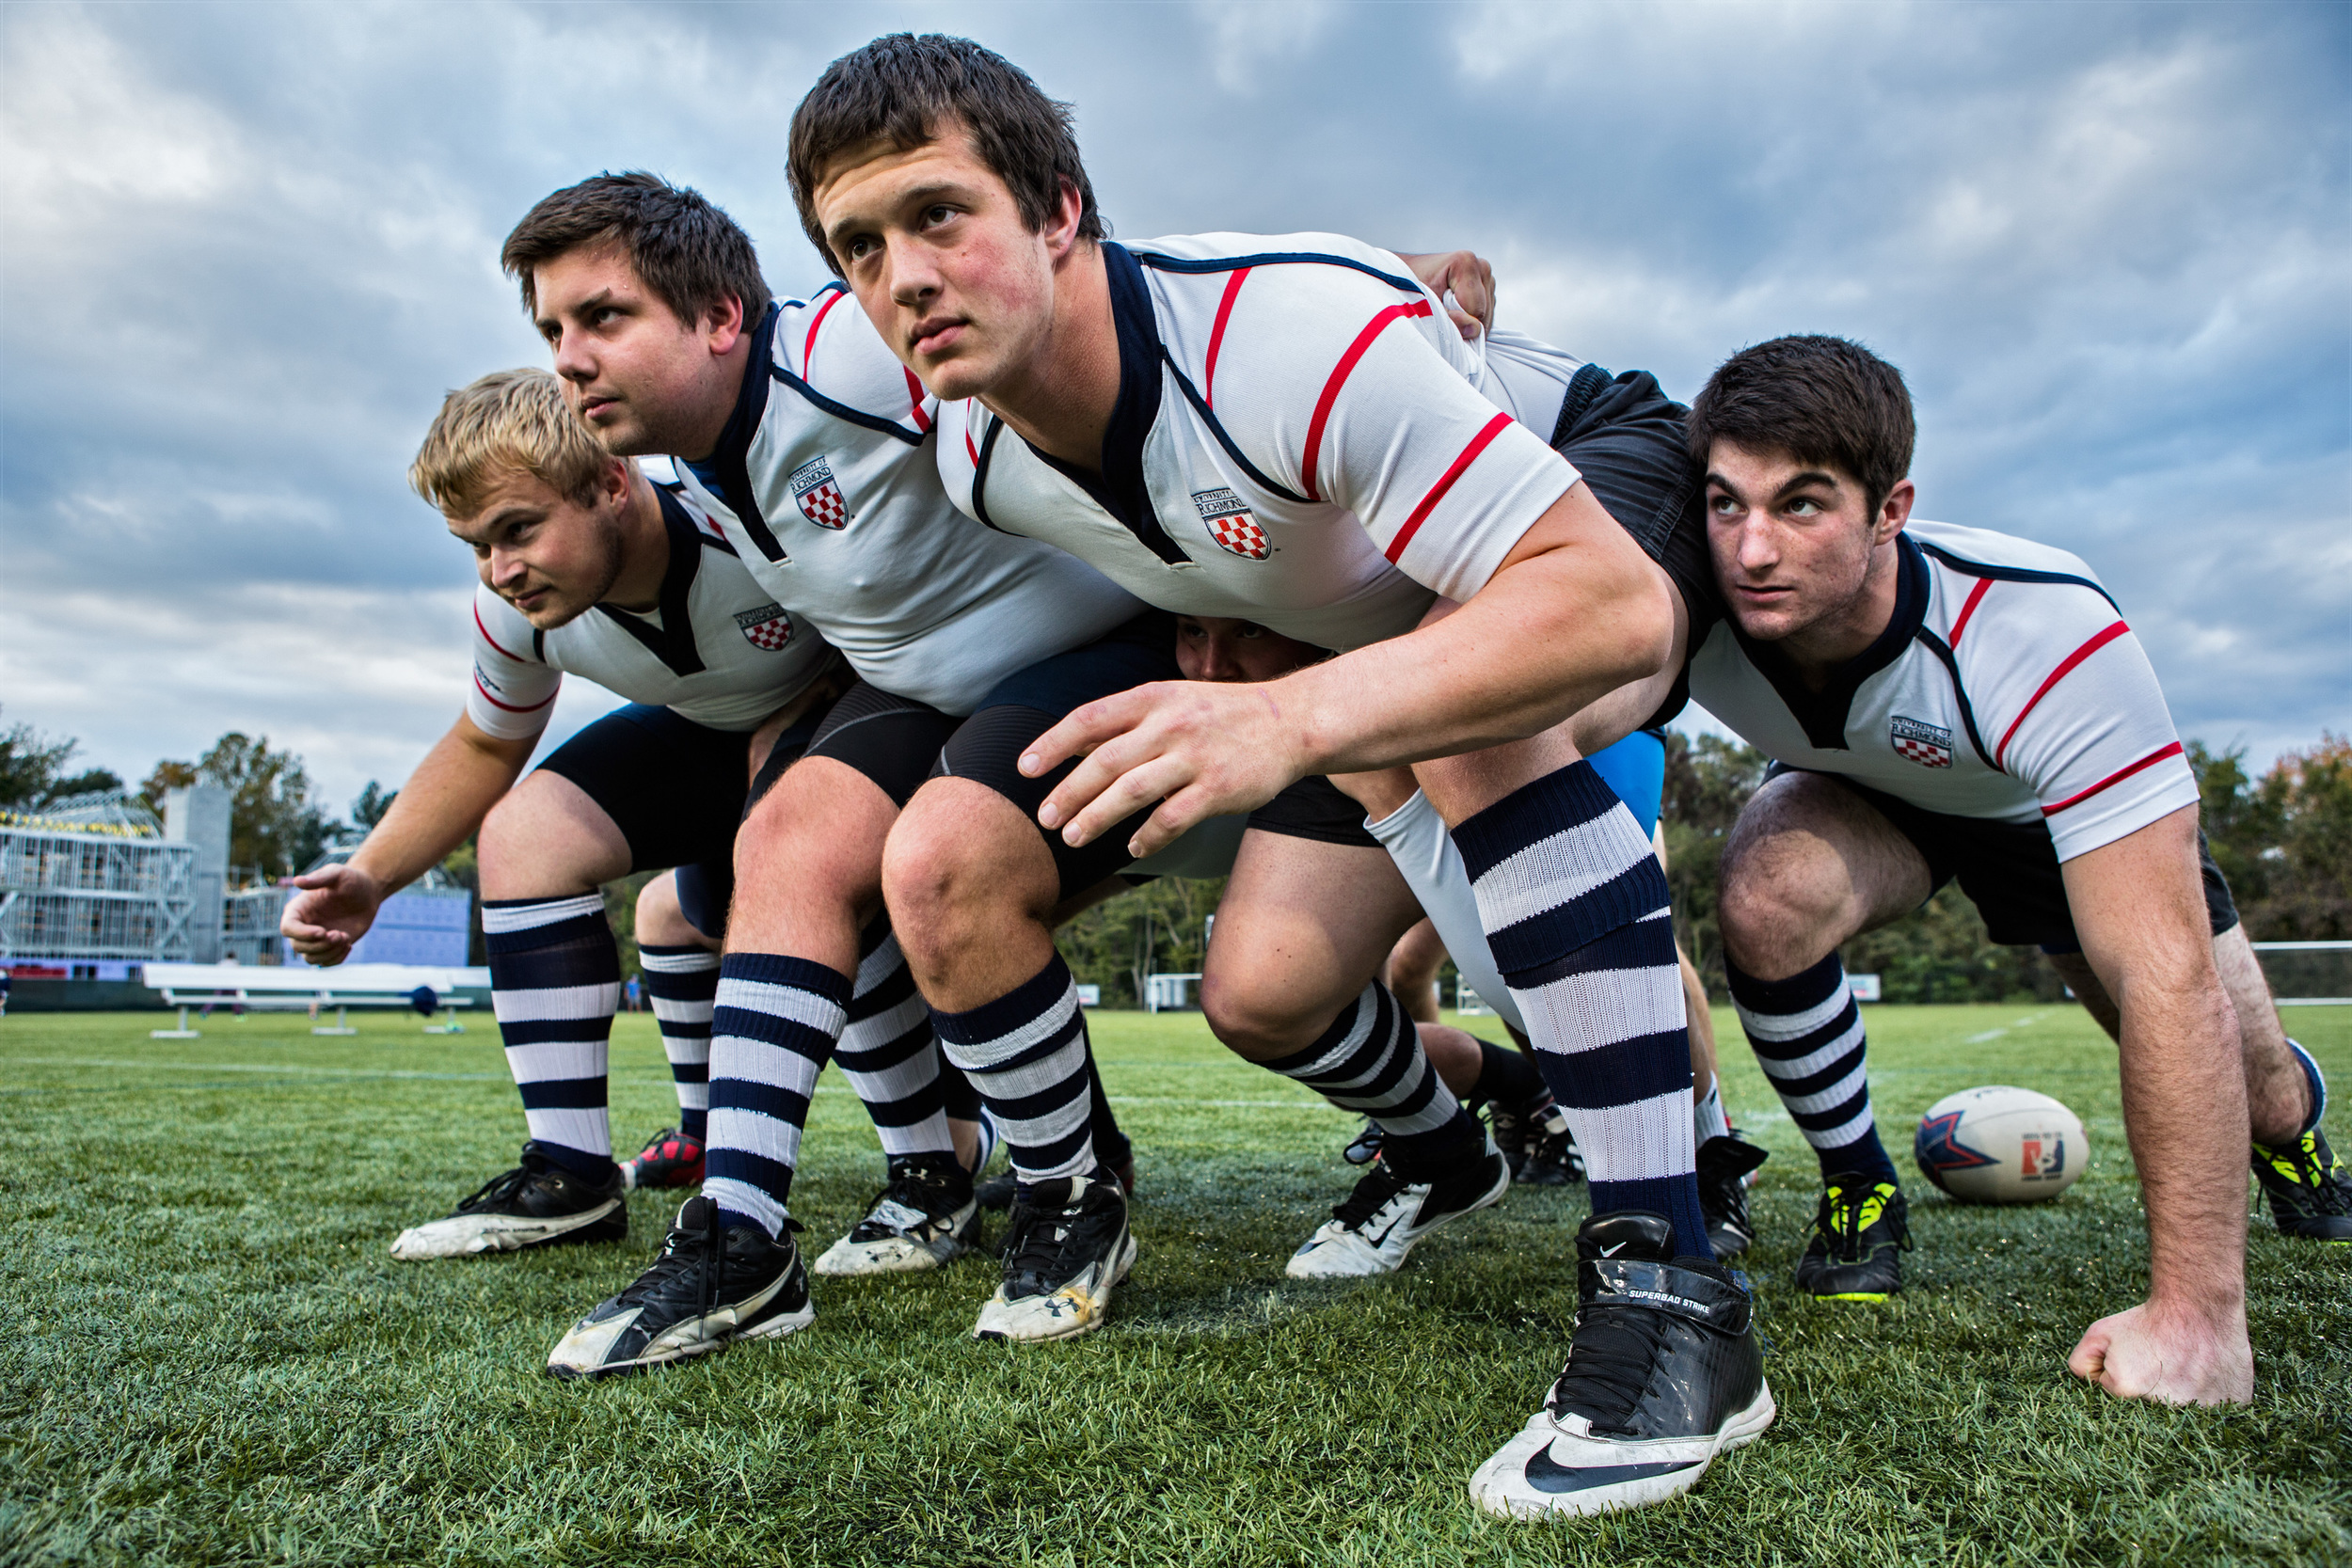 Rugby_S0A0407.jpg